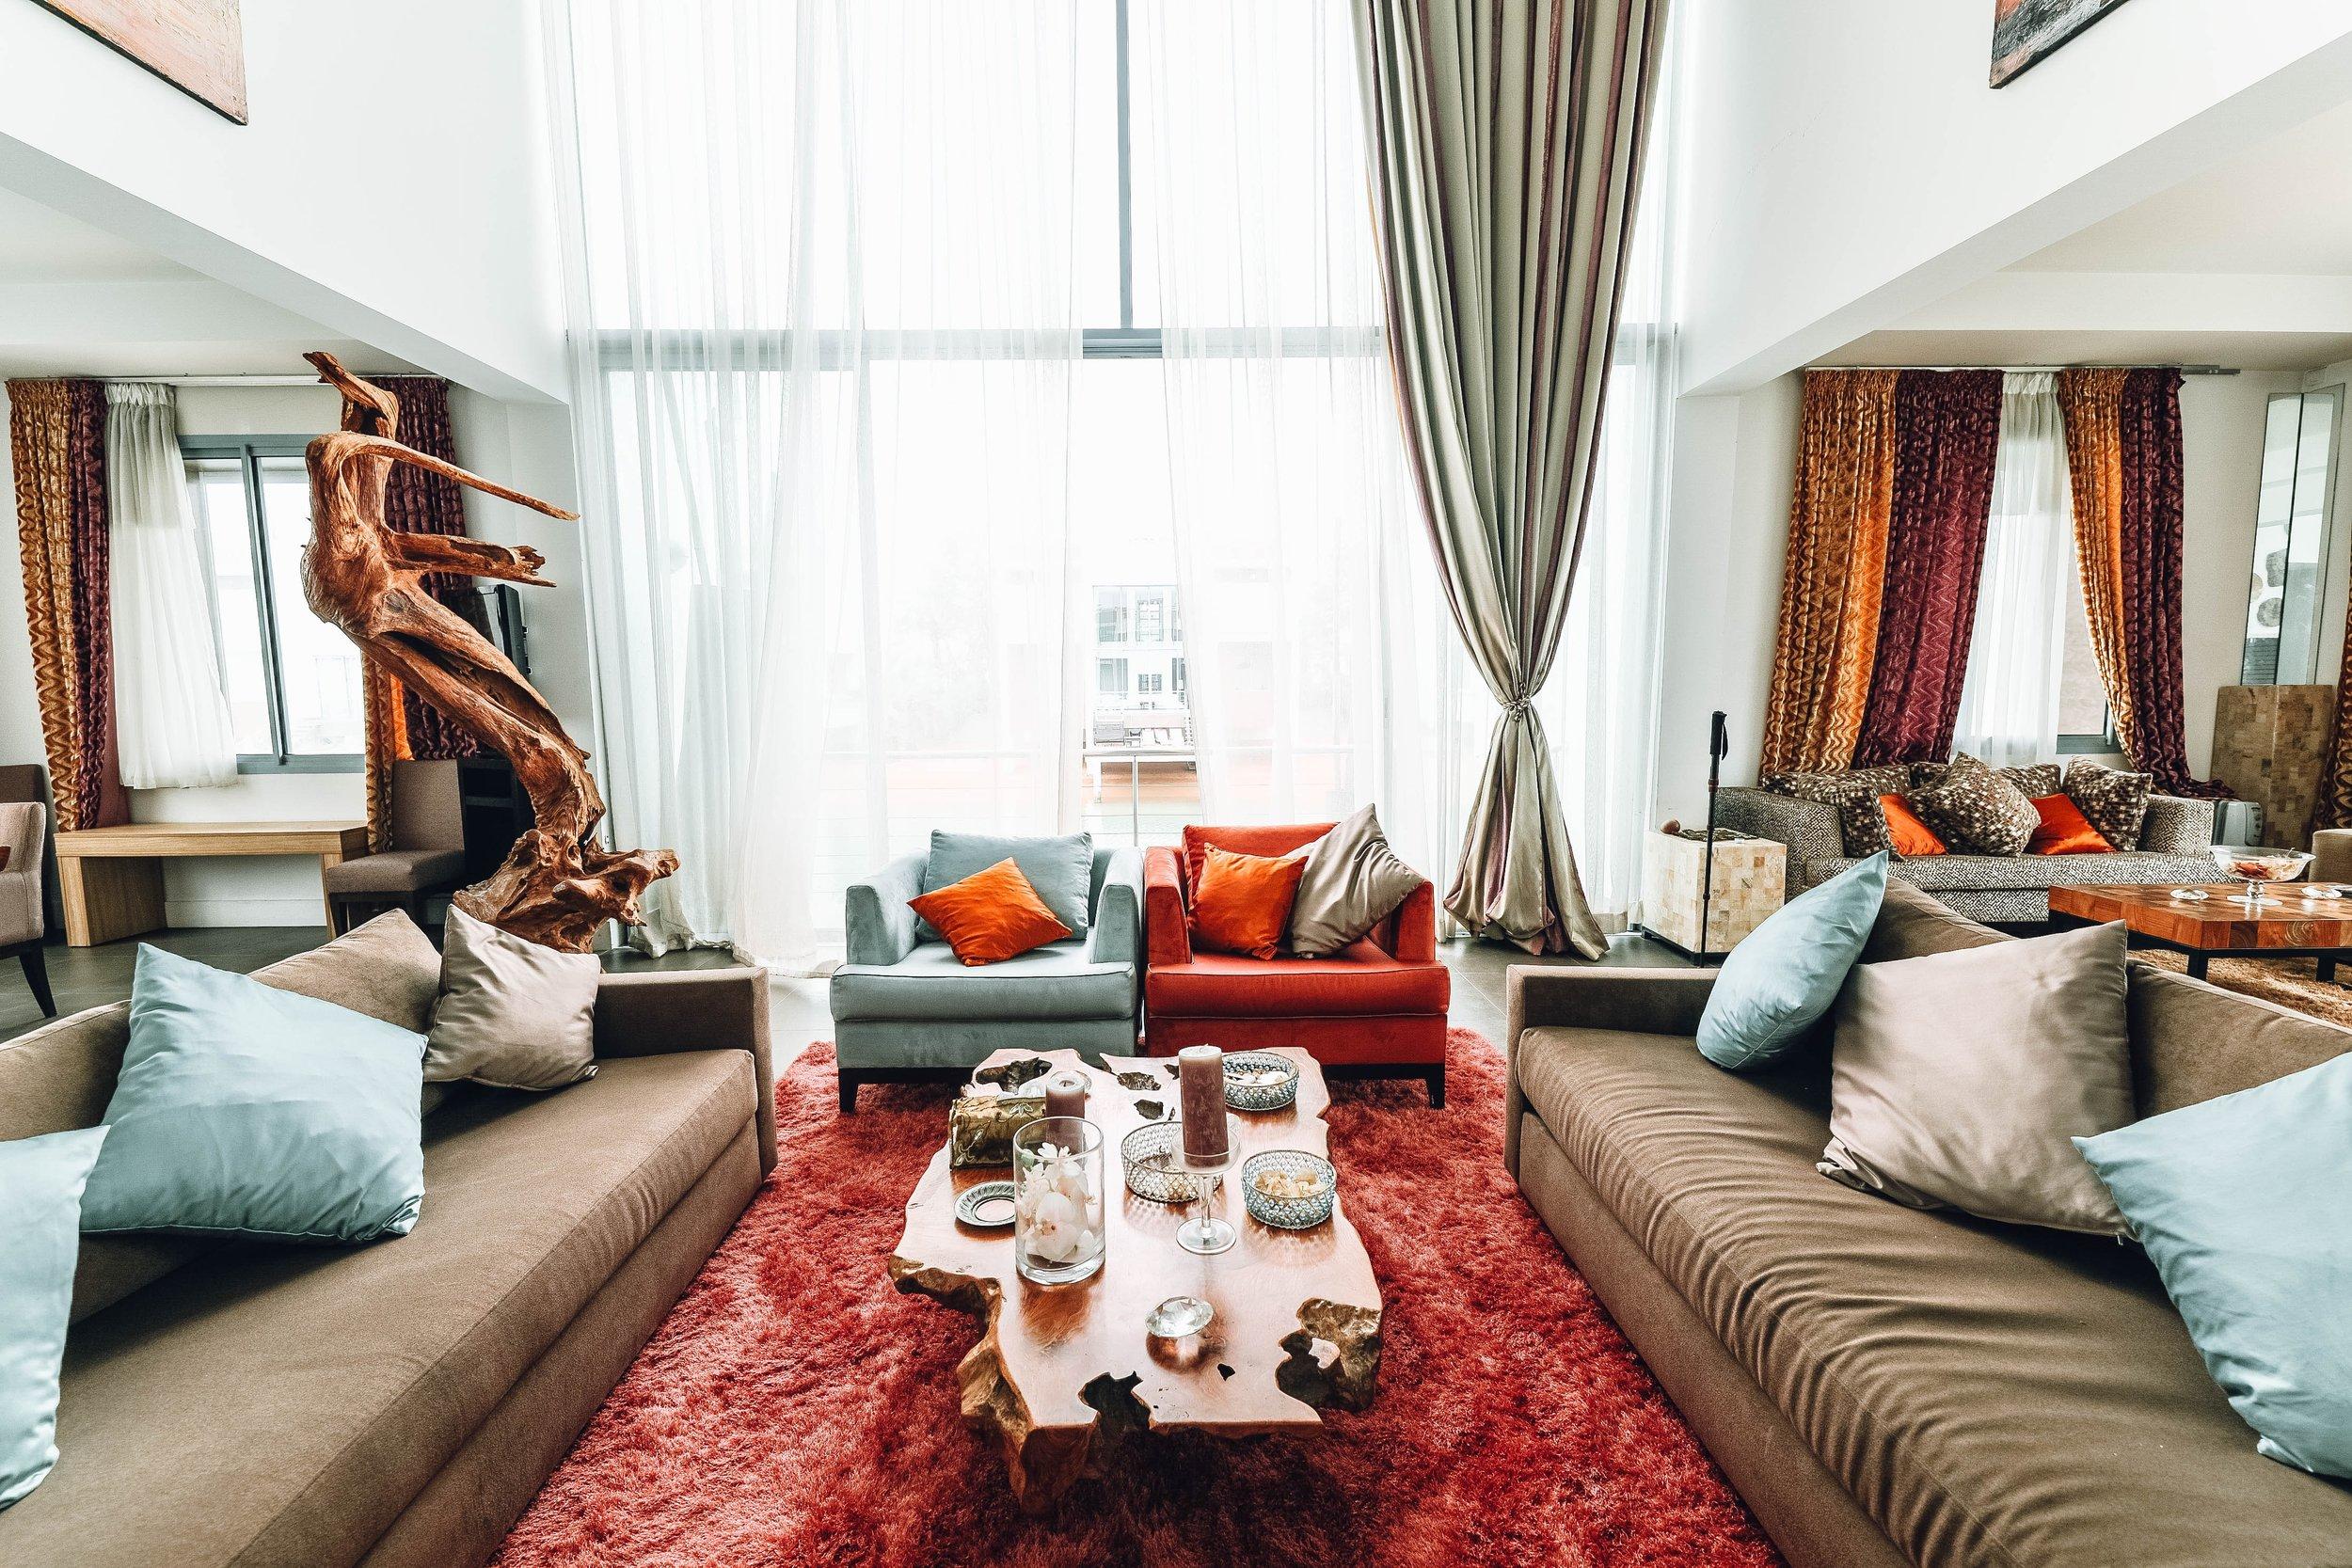 comfort-curtain-cushion-2029663.jpg